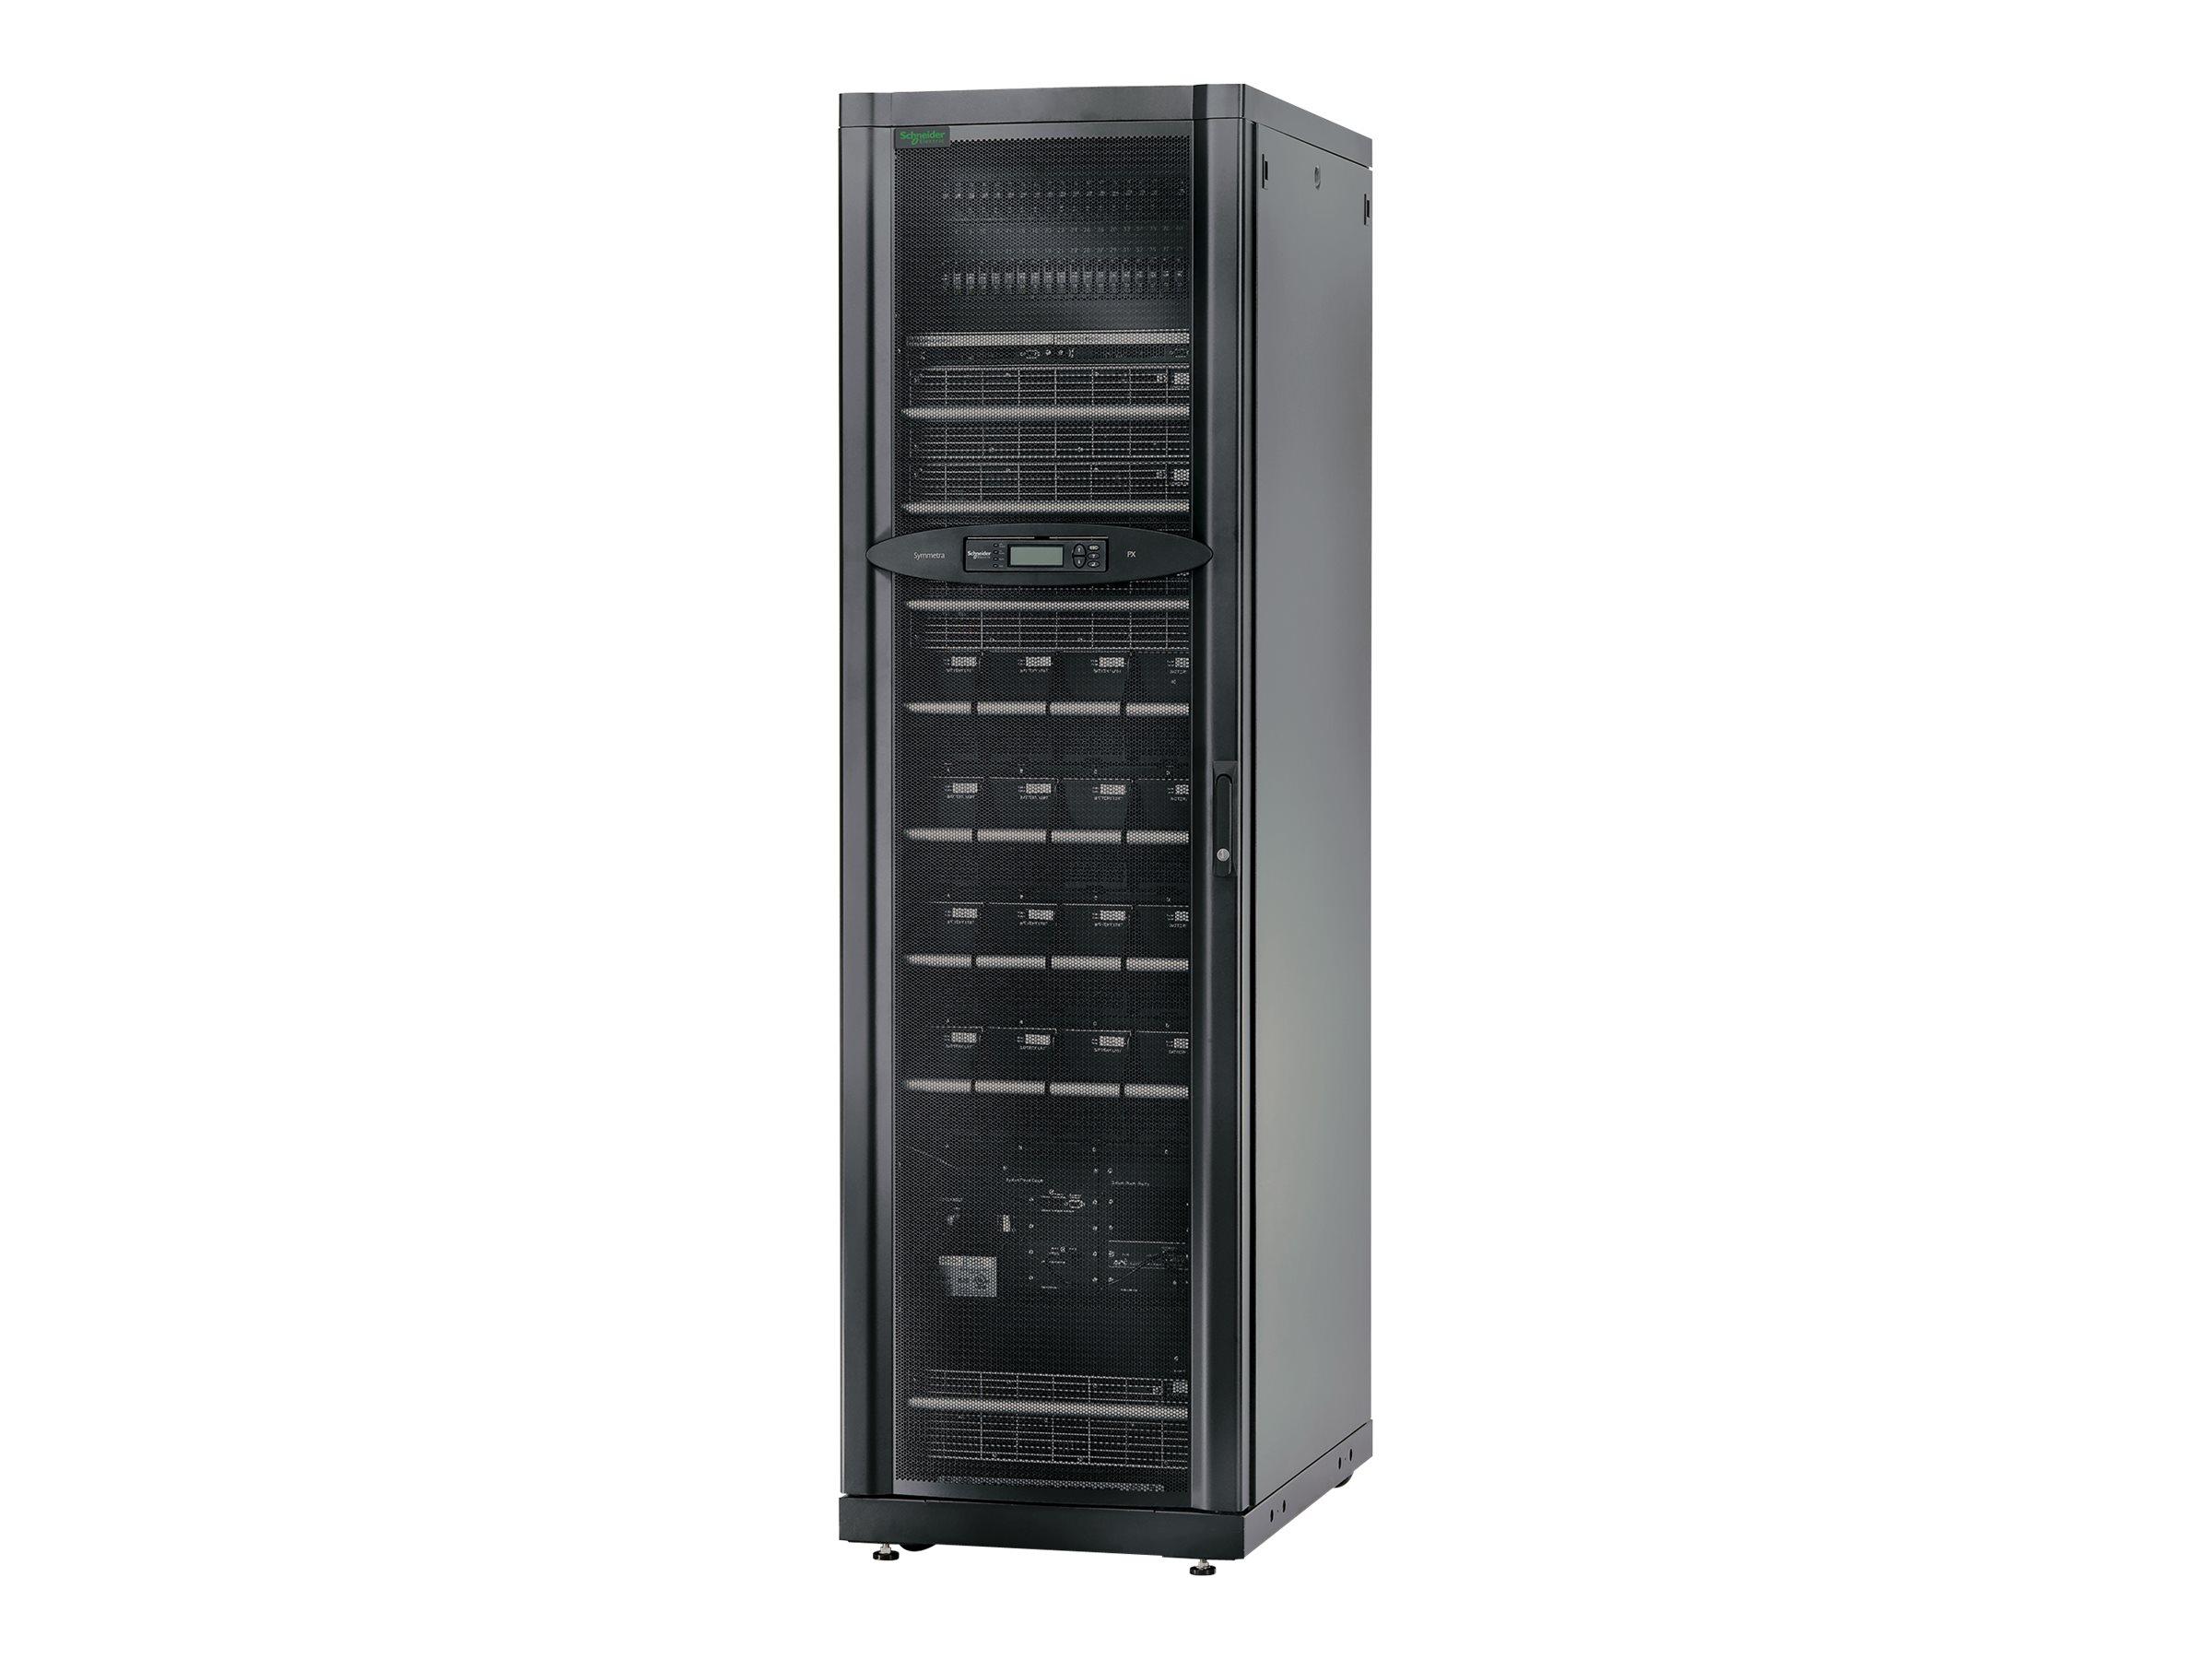 APC InfraStruXure - UPS - 20 kW - 20000 VA